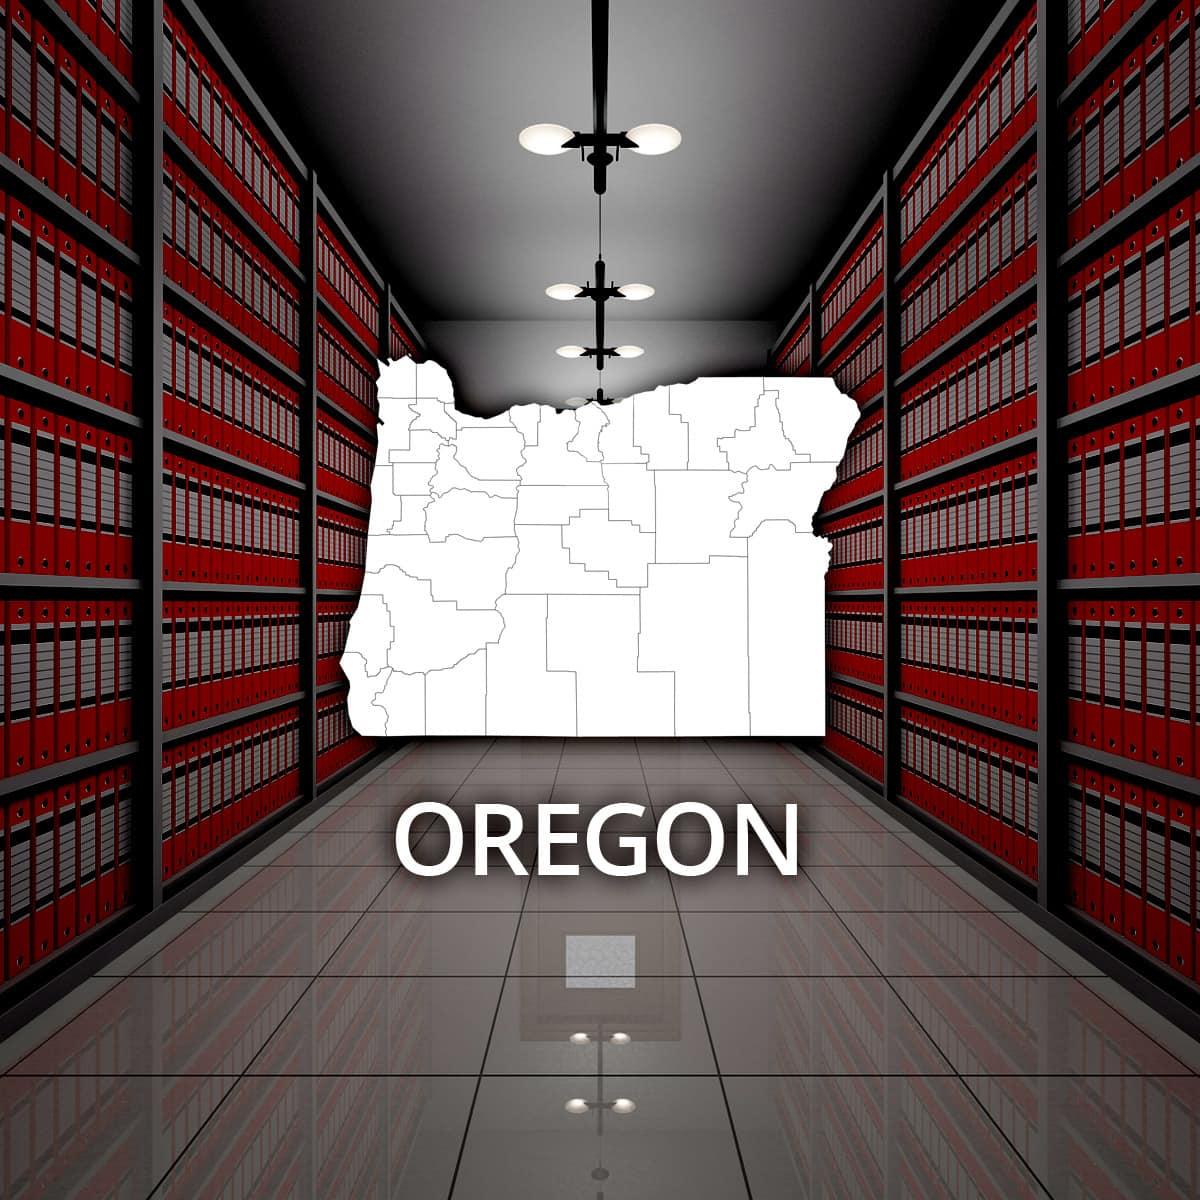 Oregon Public Records